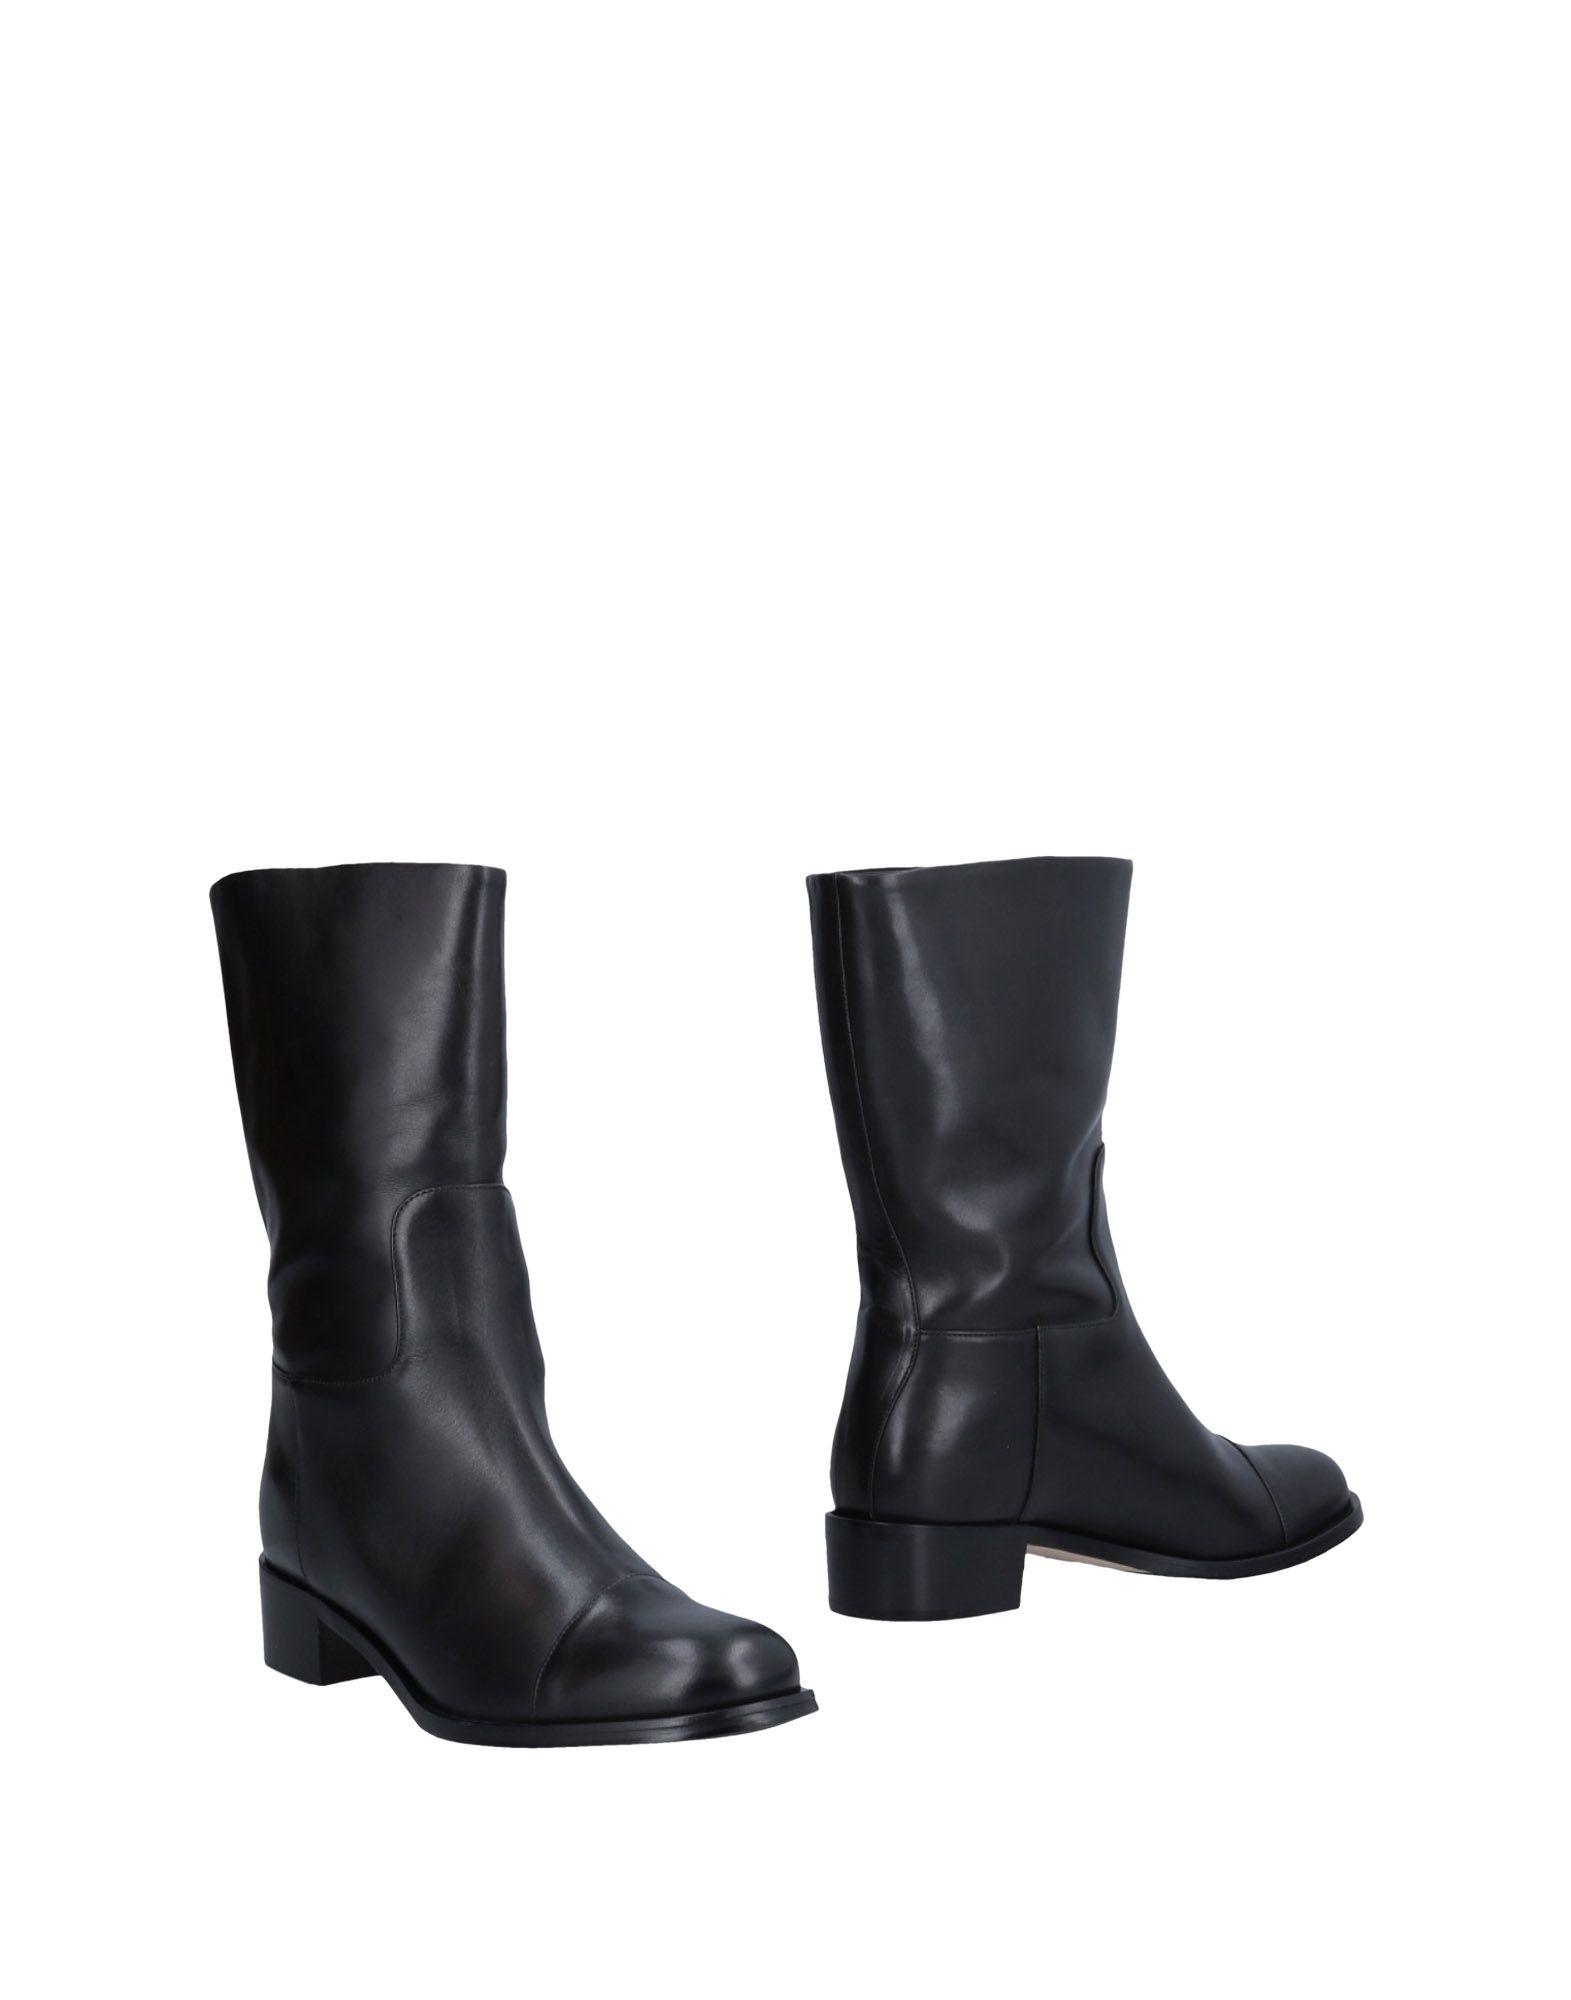 Moda Stivaletti Cavallini Donna - 11484001JV